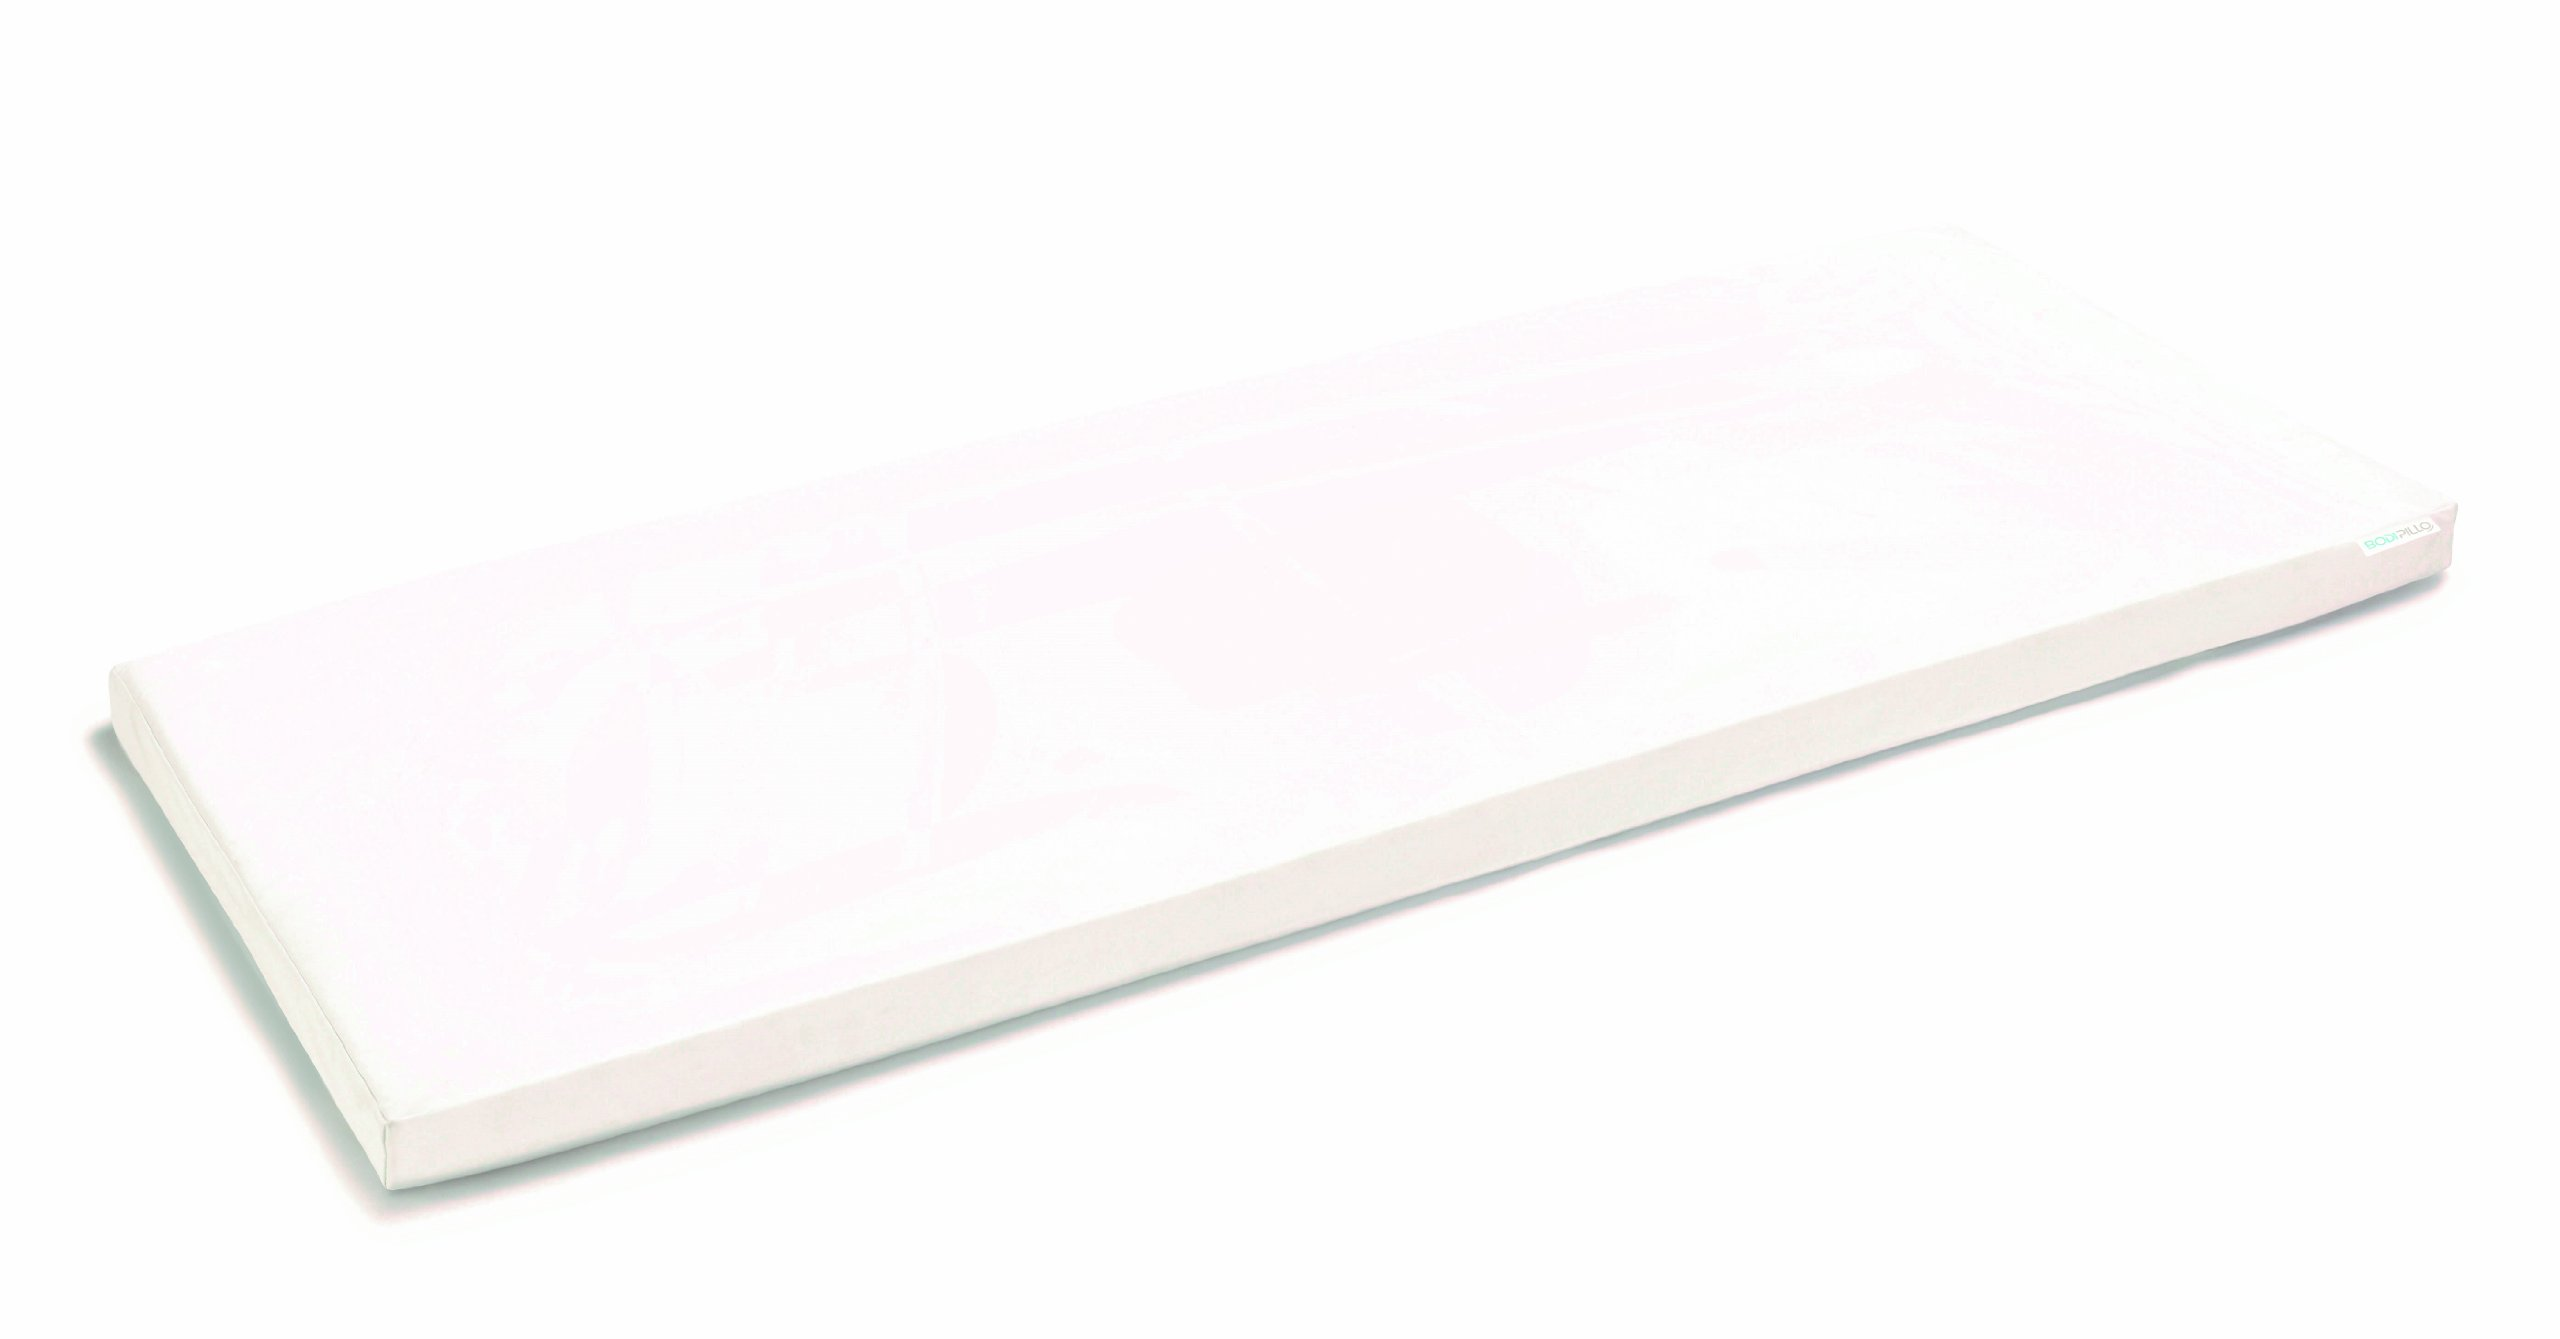 Bodipillo - Antibacterial Memory Foam Topper for Massage Table